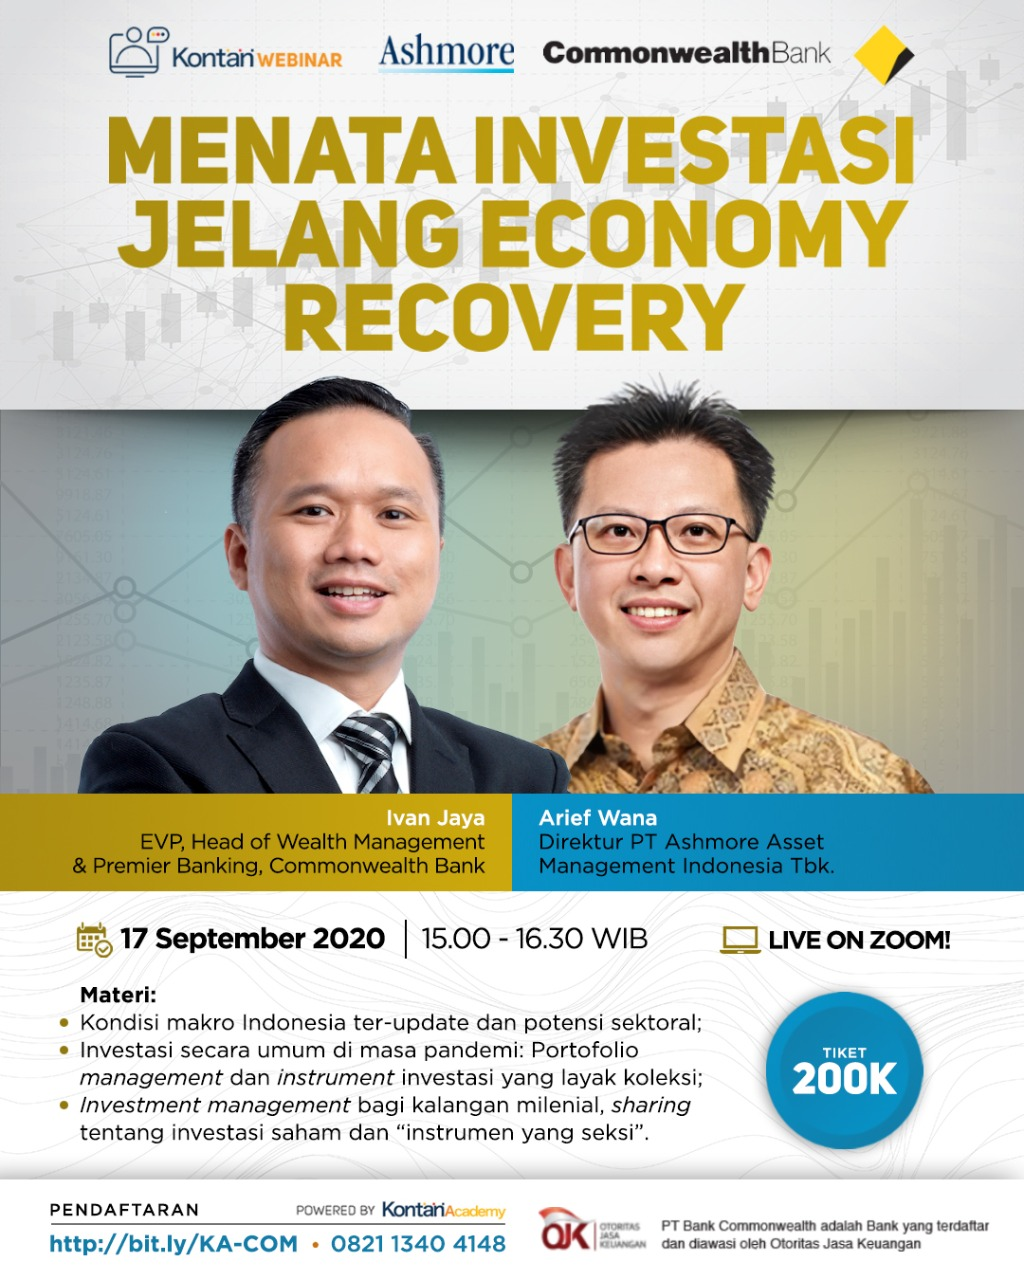 Menata Investasi Jelang Economy Recovery